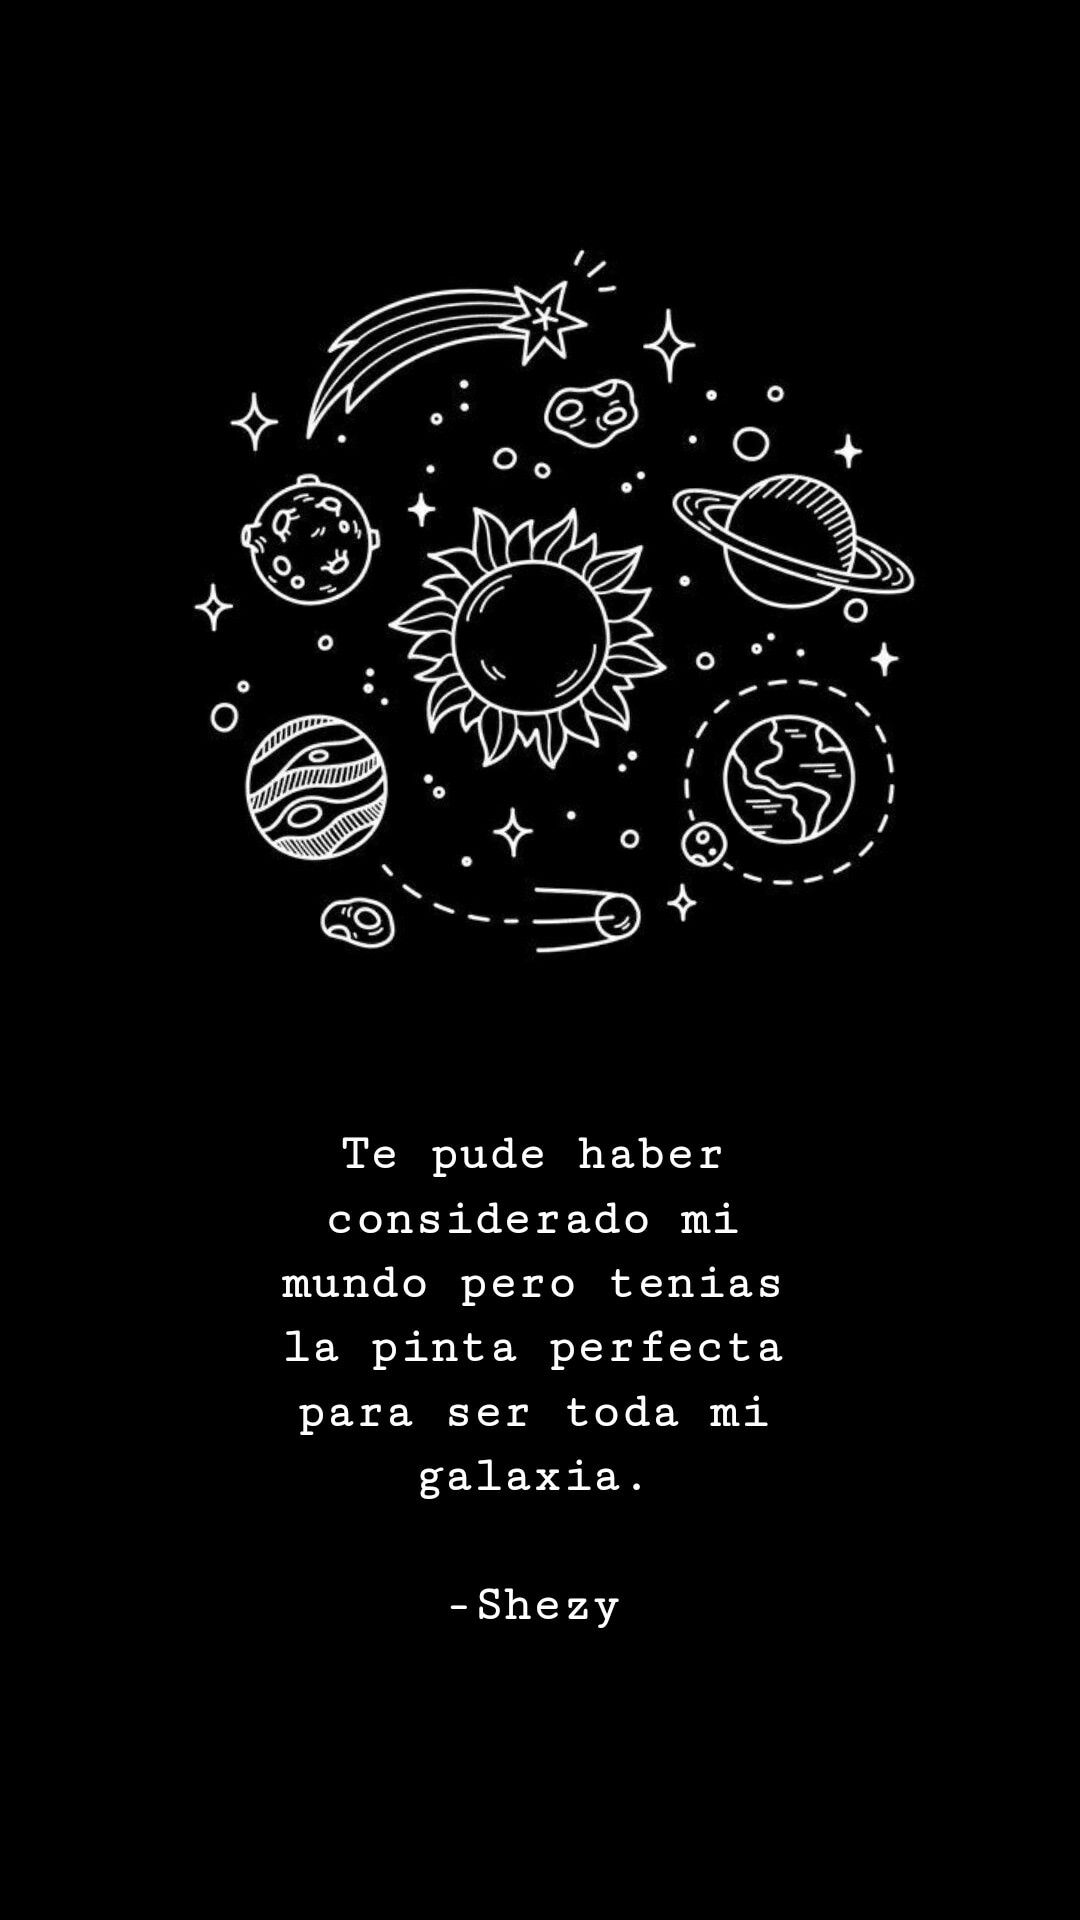 Puesss..